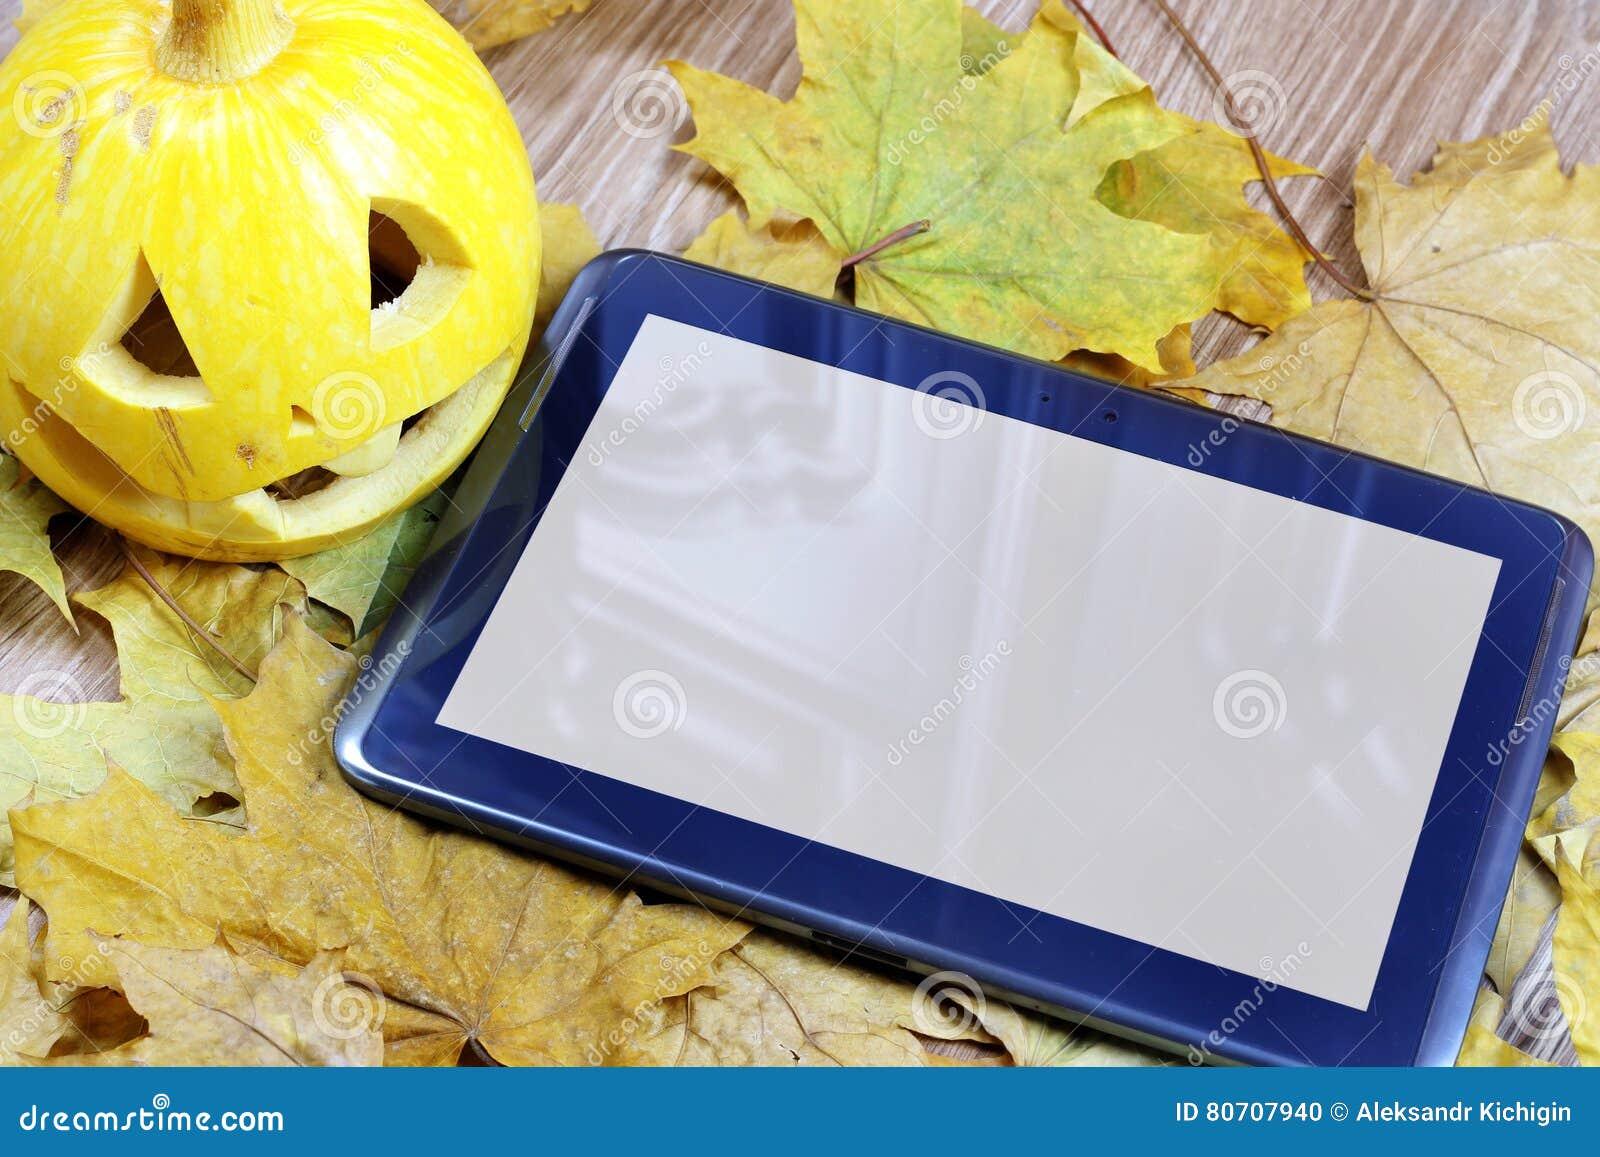 halloween pumpkin and tablet stock photo - image of halloween